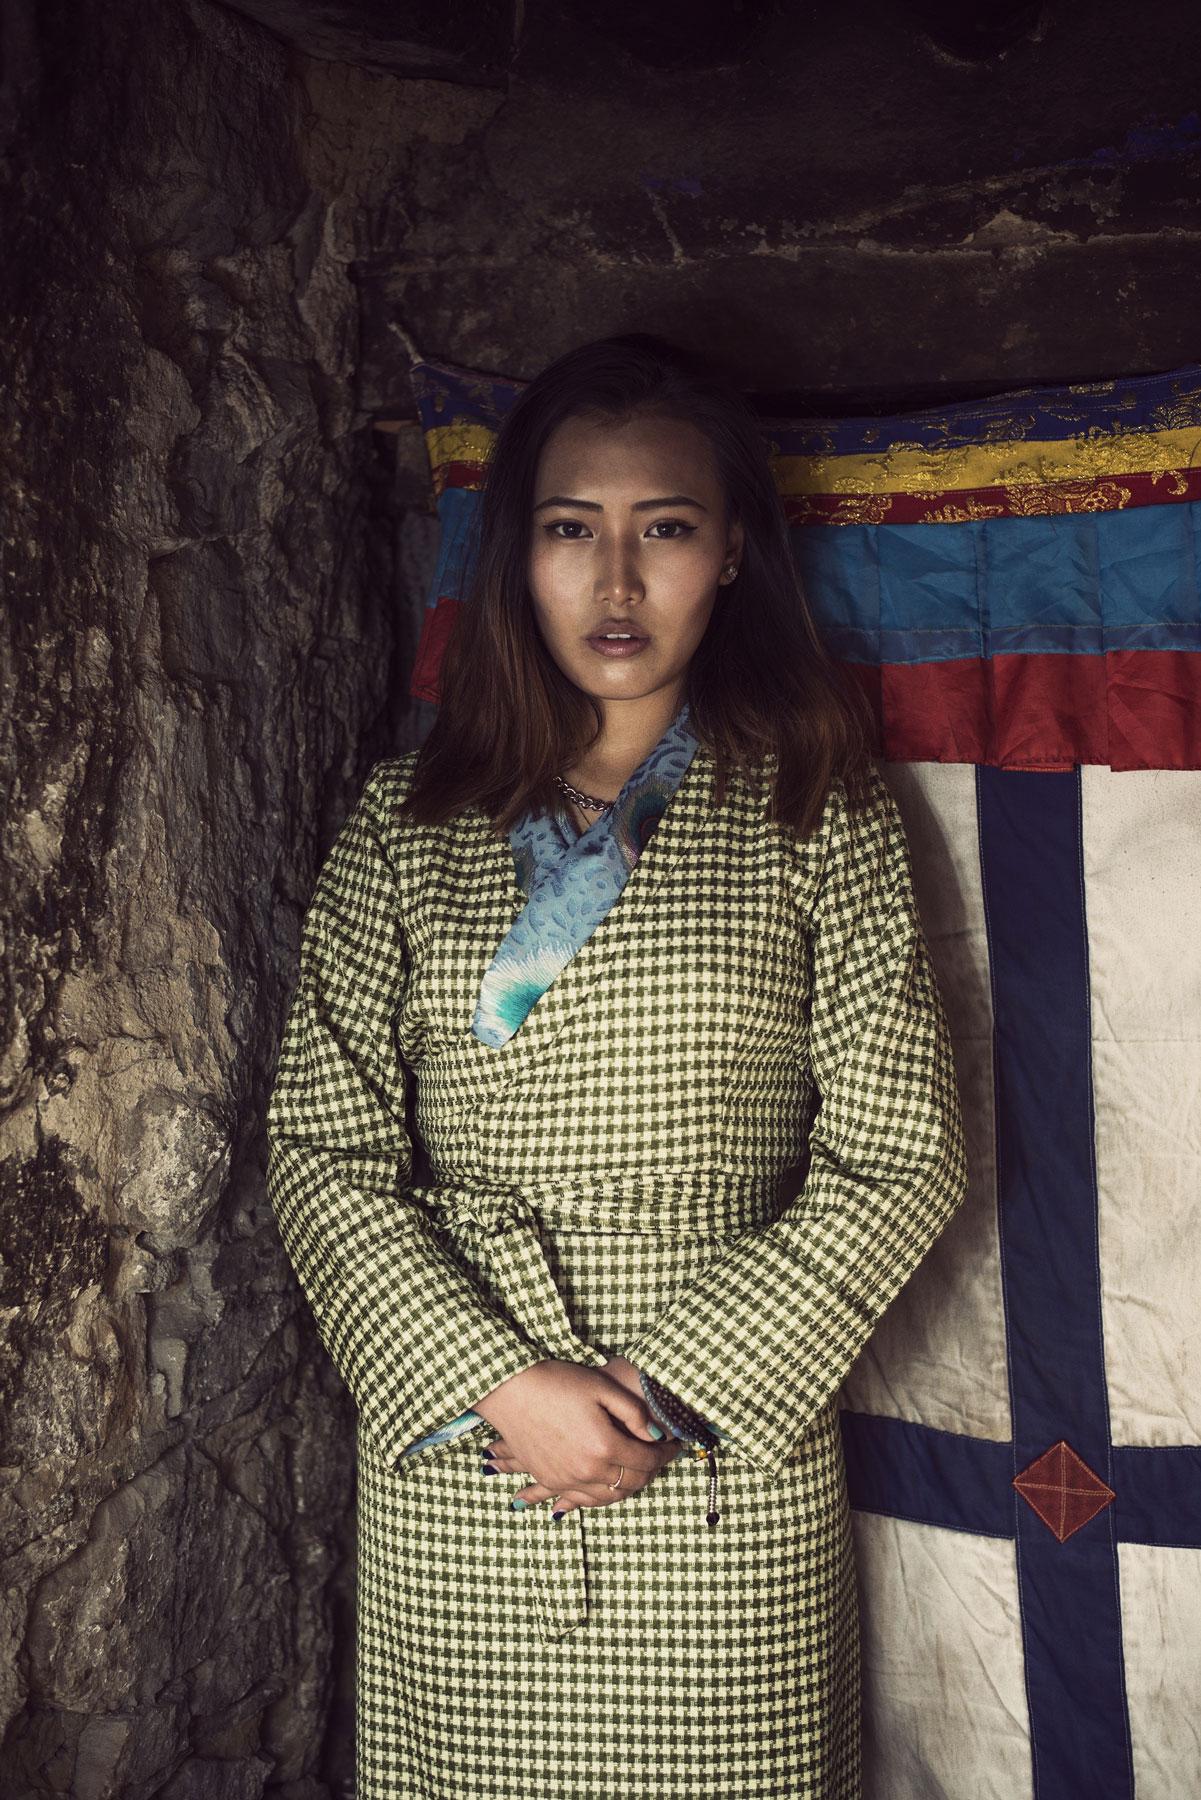 lhasa-tibet-youth-model.jpg